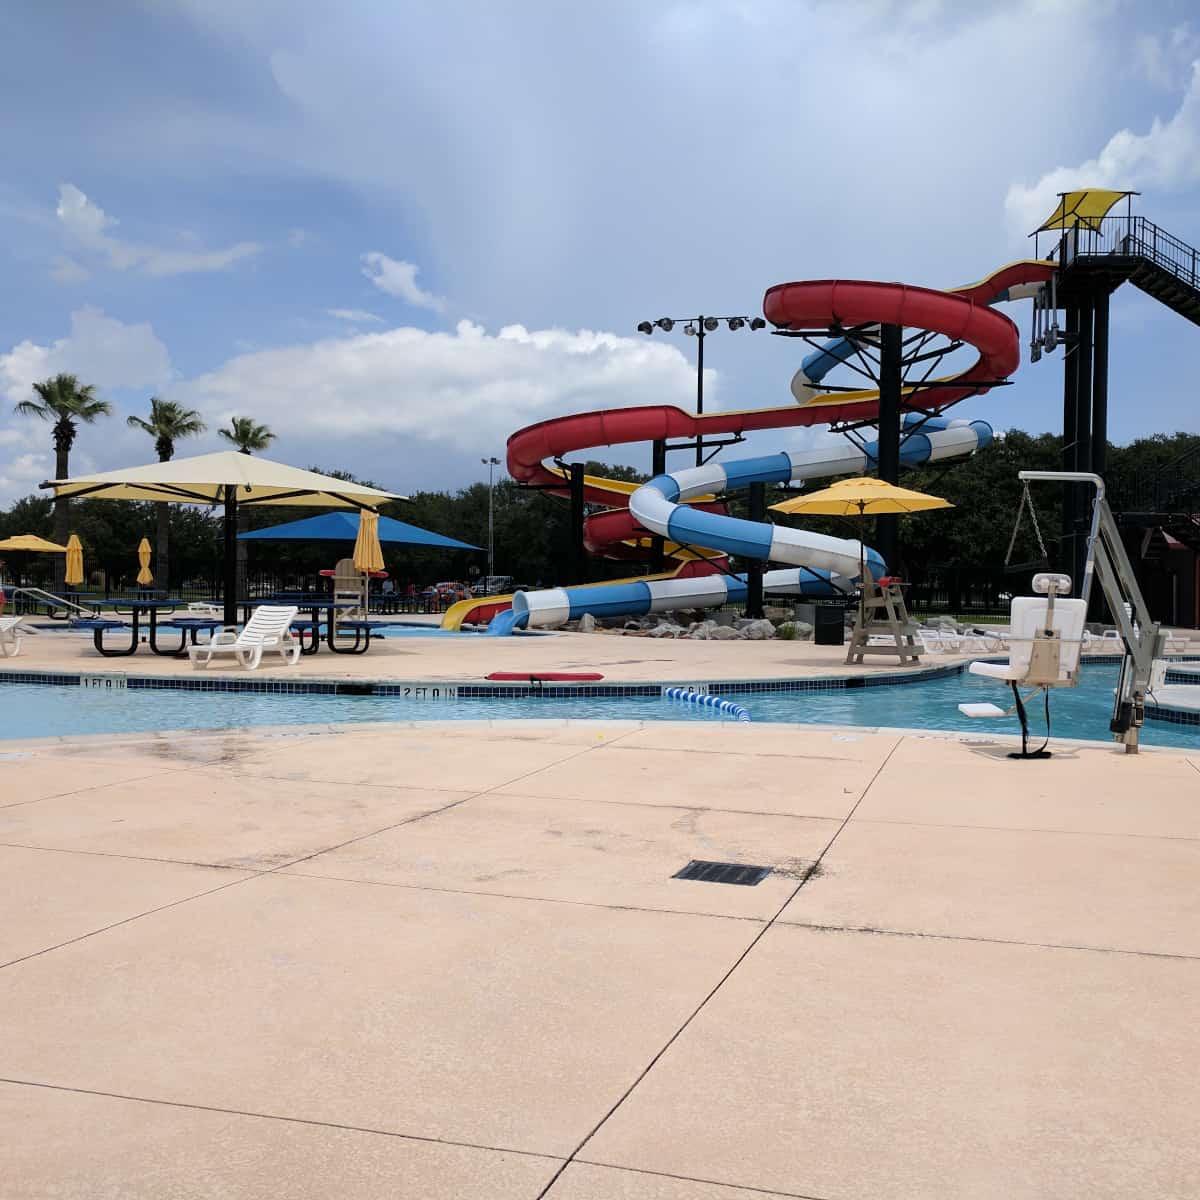 Nessler Pool Texas City waterpark big slides